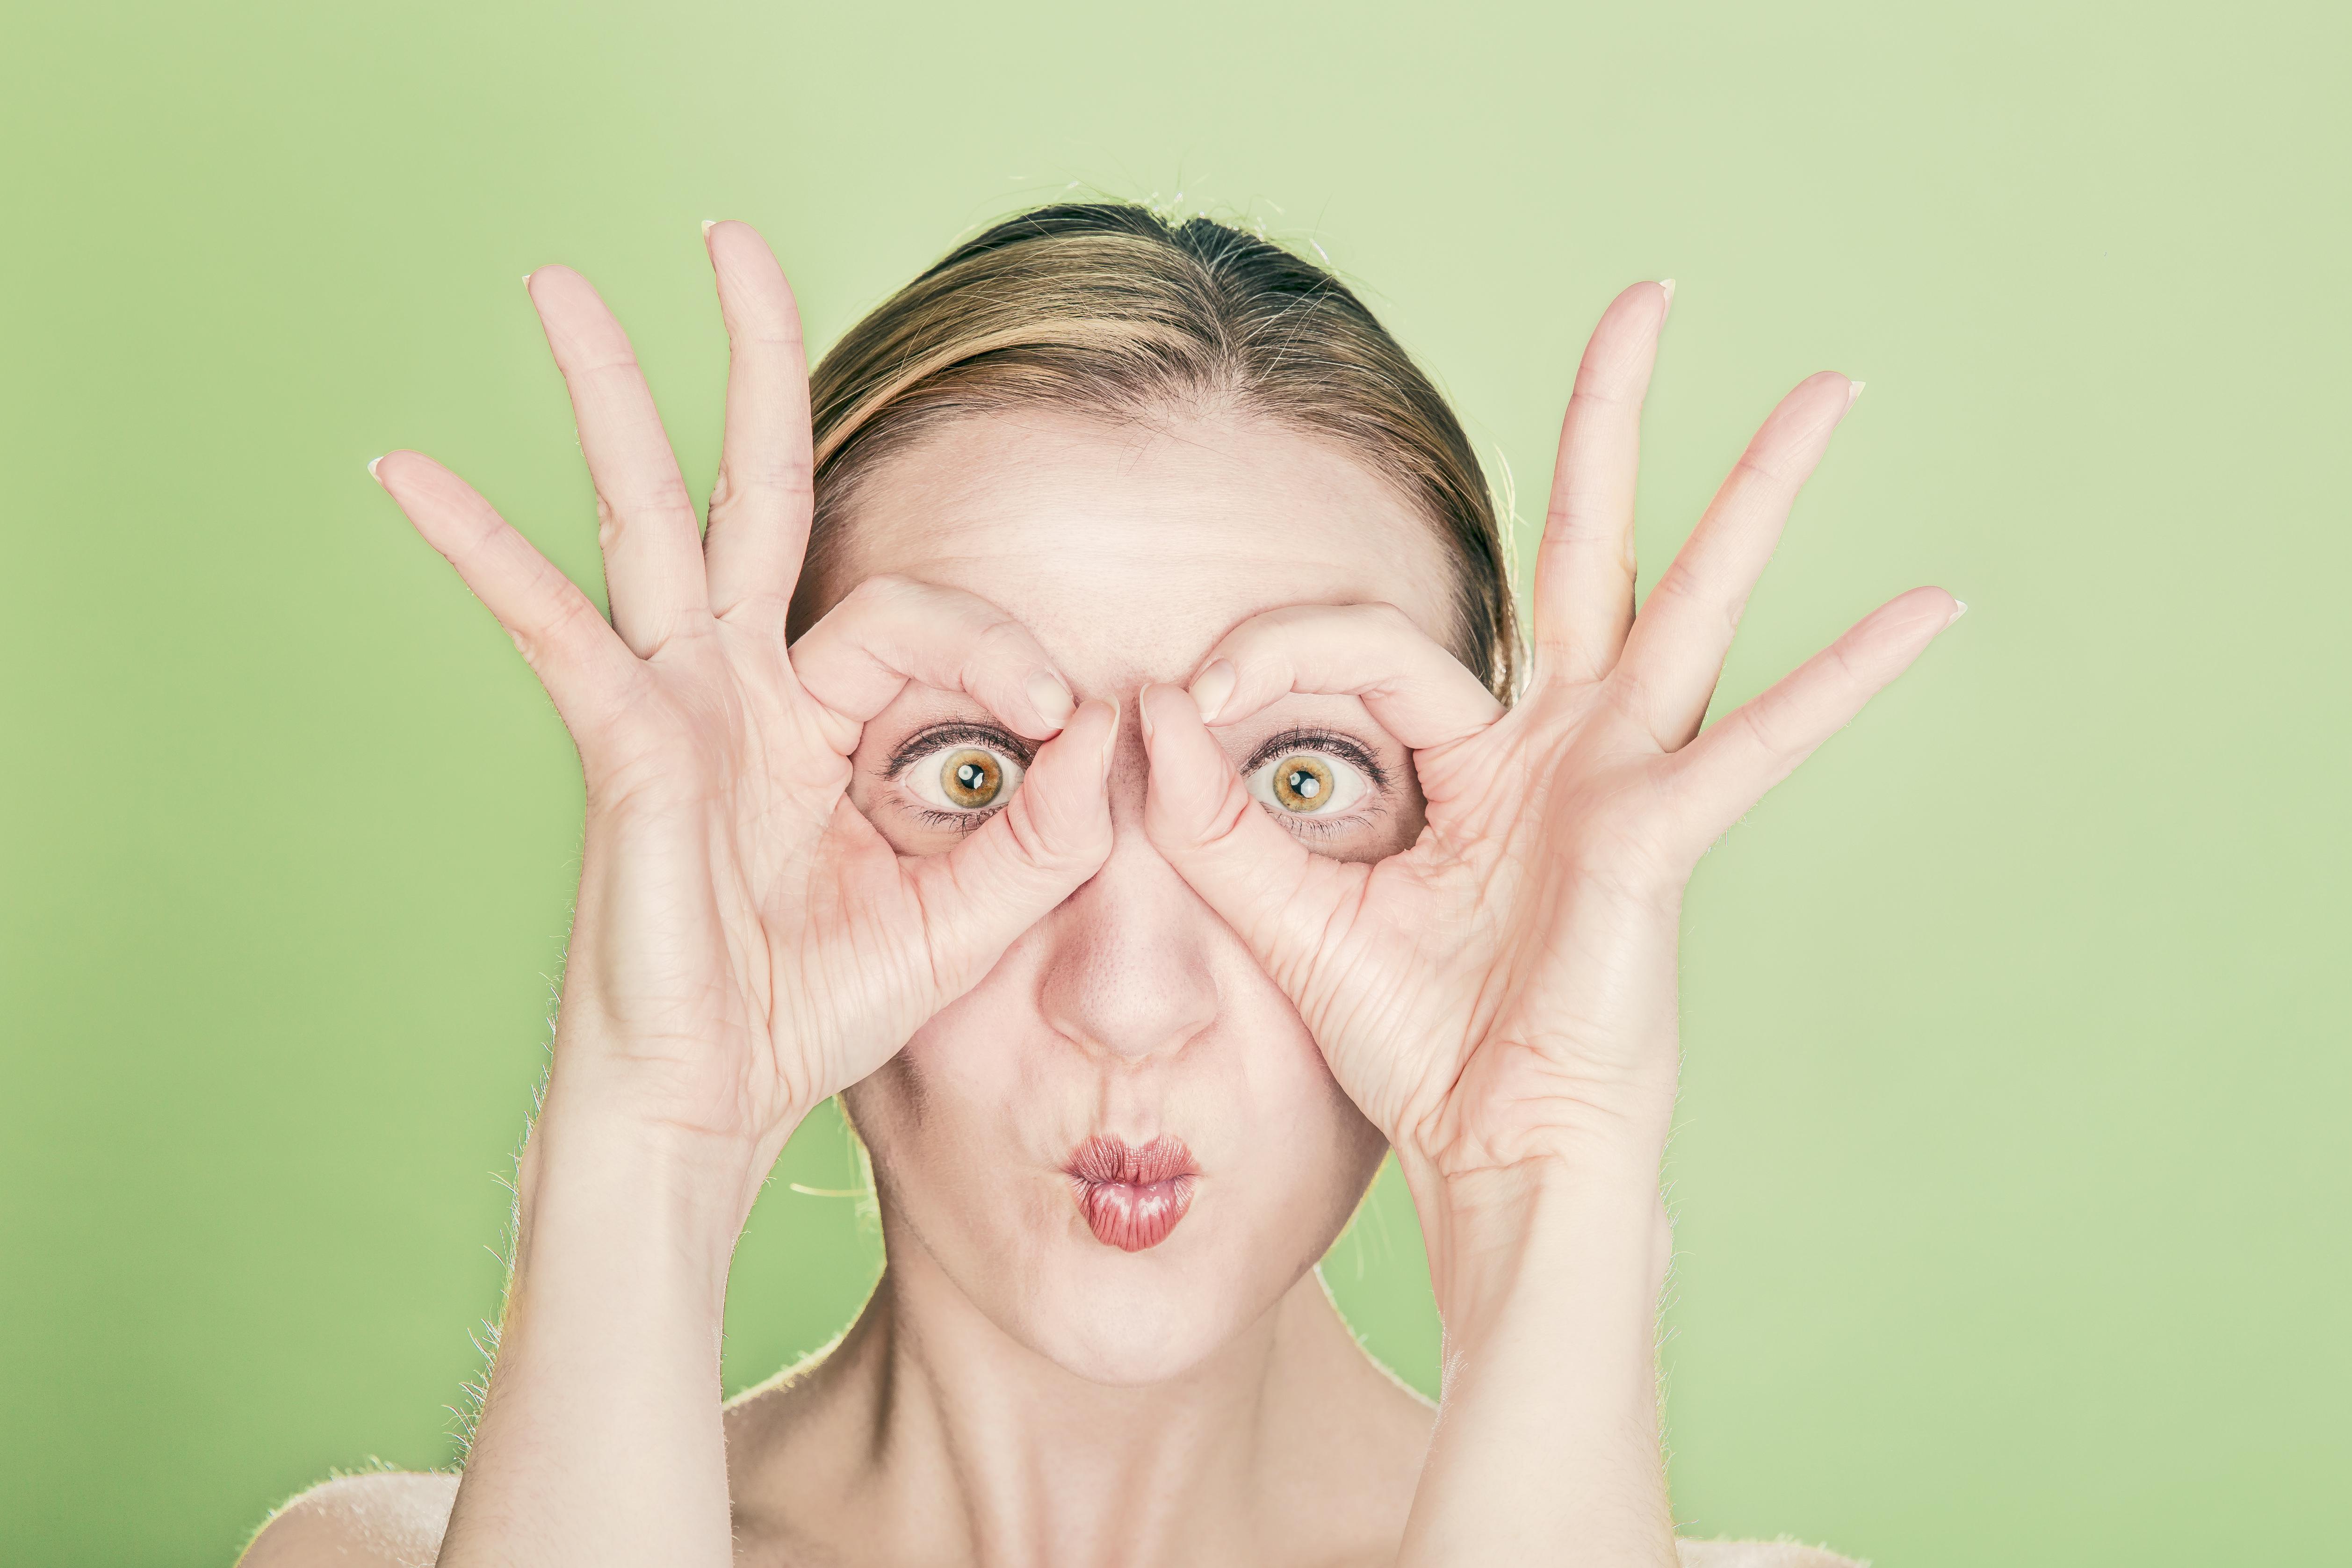 eyes-face-lips-4636